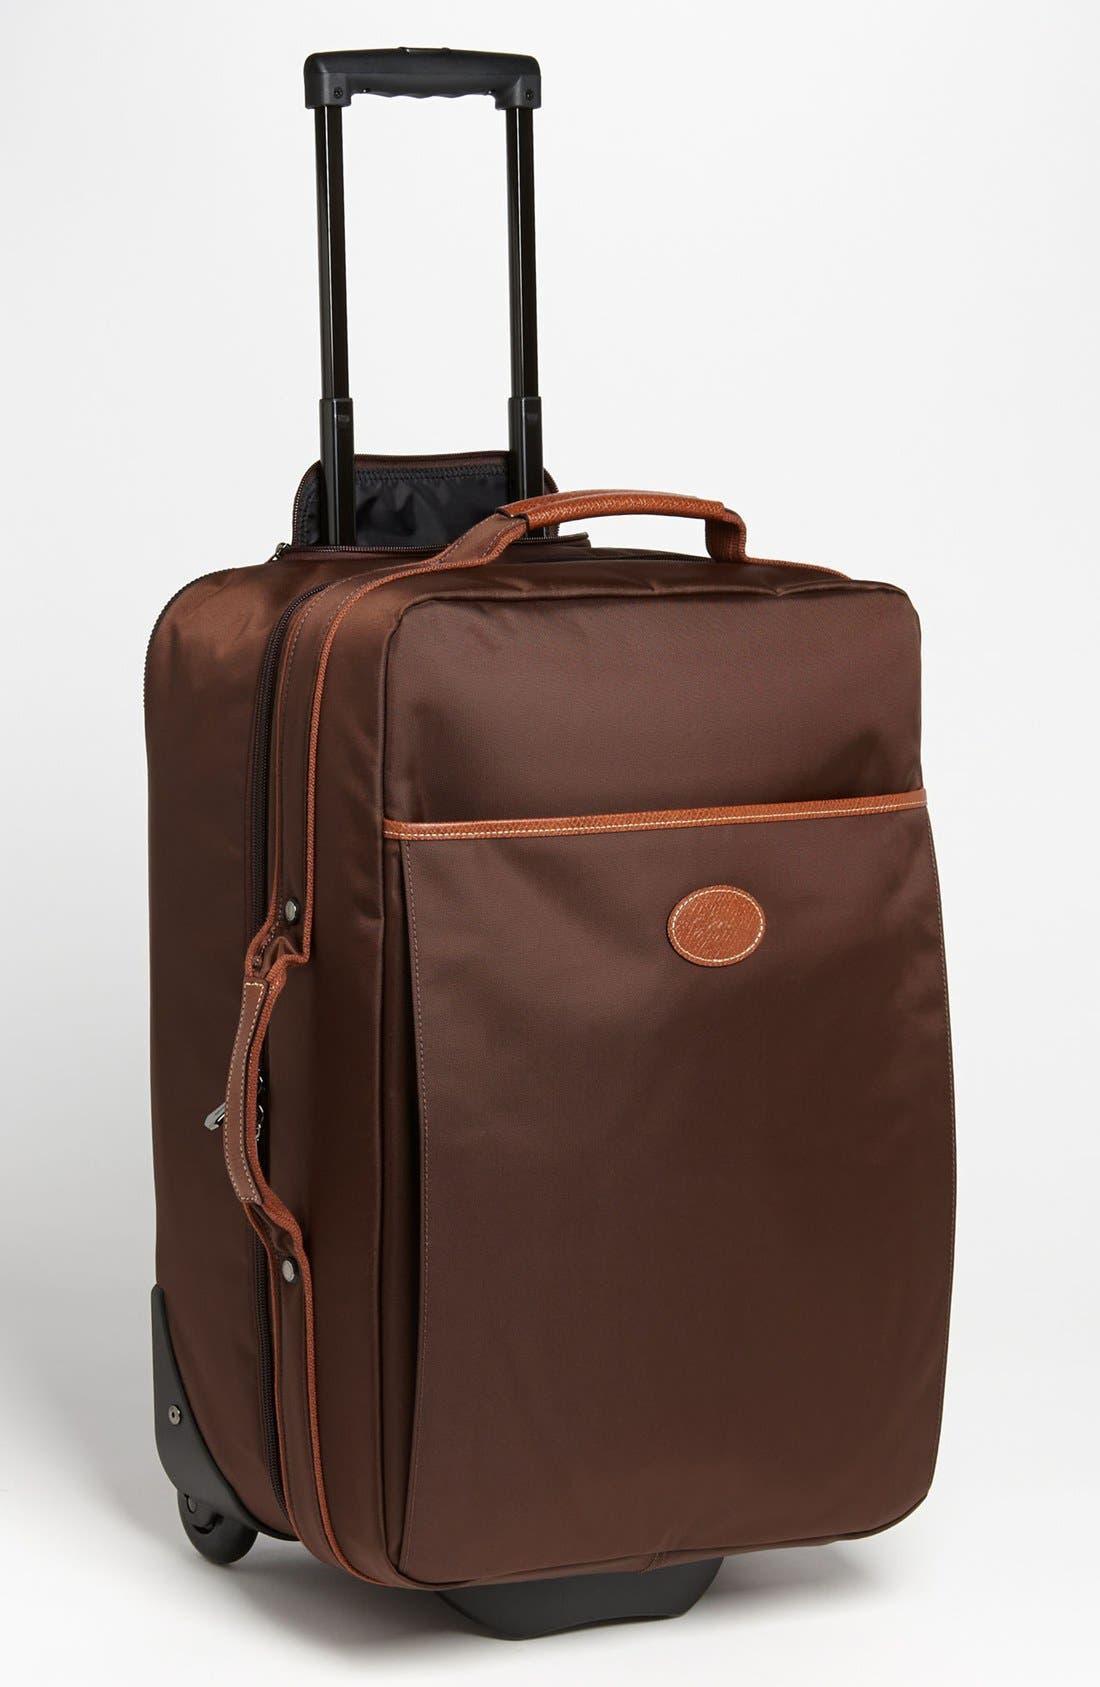 Alternate Image 1 Selected - Longchamp 'Le Pliage' Wheeled Carry-On (21 Inch)